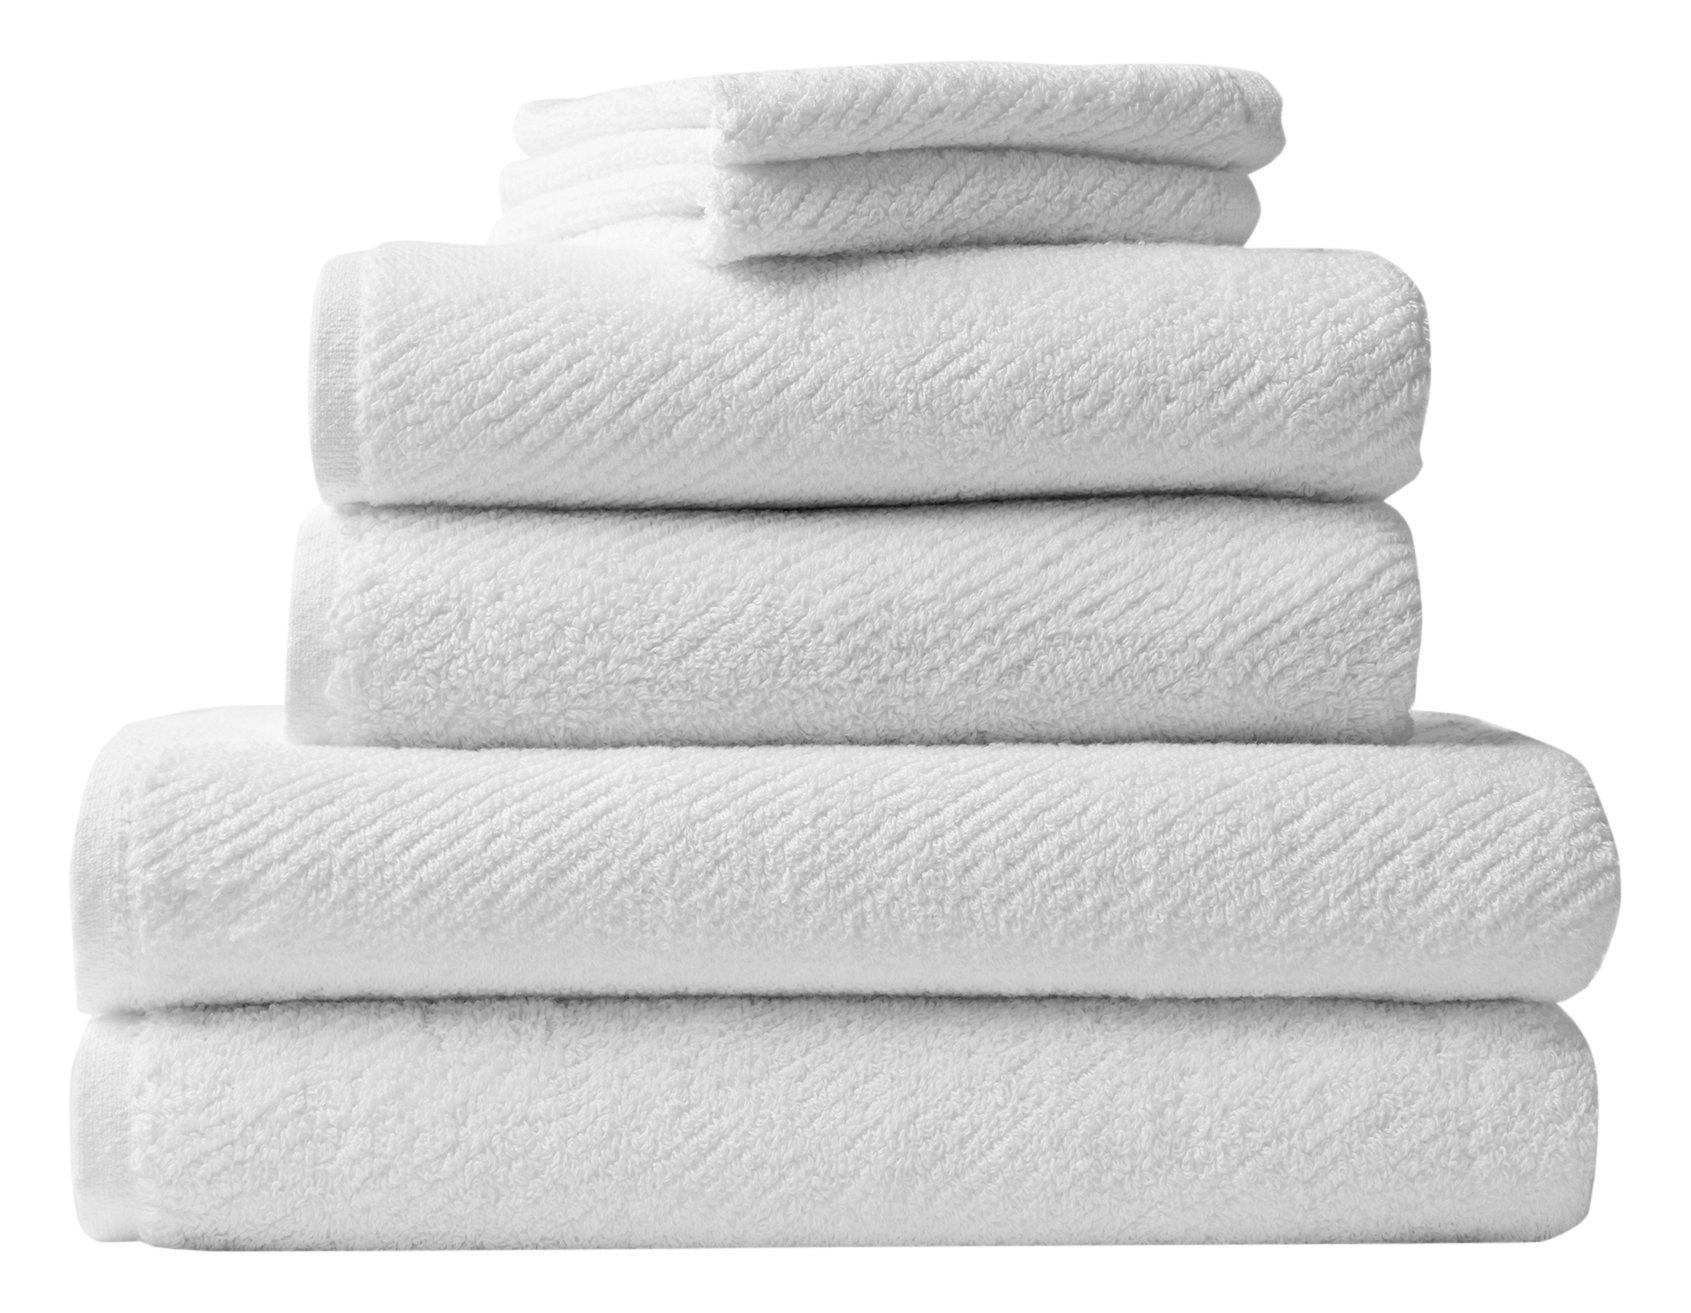 Coyuchi Air Weight Organic 6pc Towel Set, BT, HT, WC, Alpine White